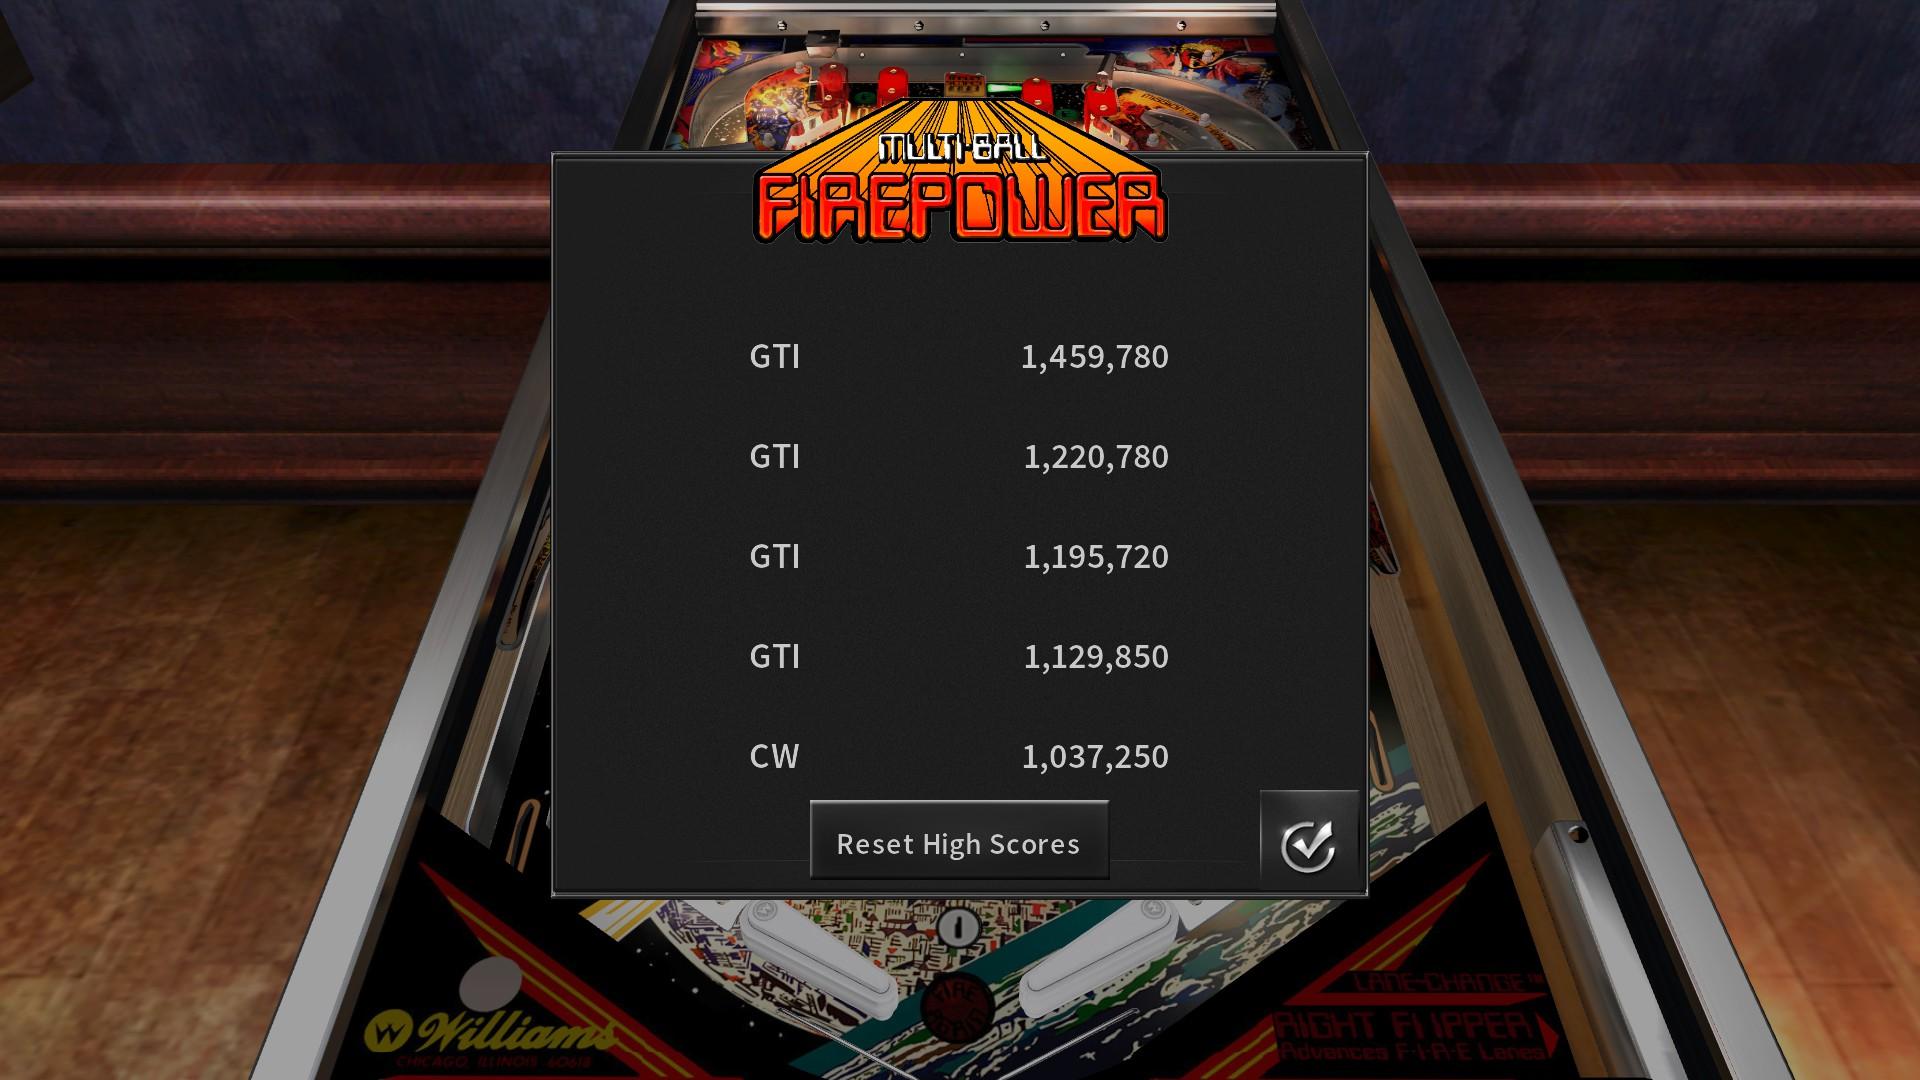 GTibel: Pinball Arcade: Firepower (PC) 1,459,780 points on 2018-02-02 14:58:57